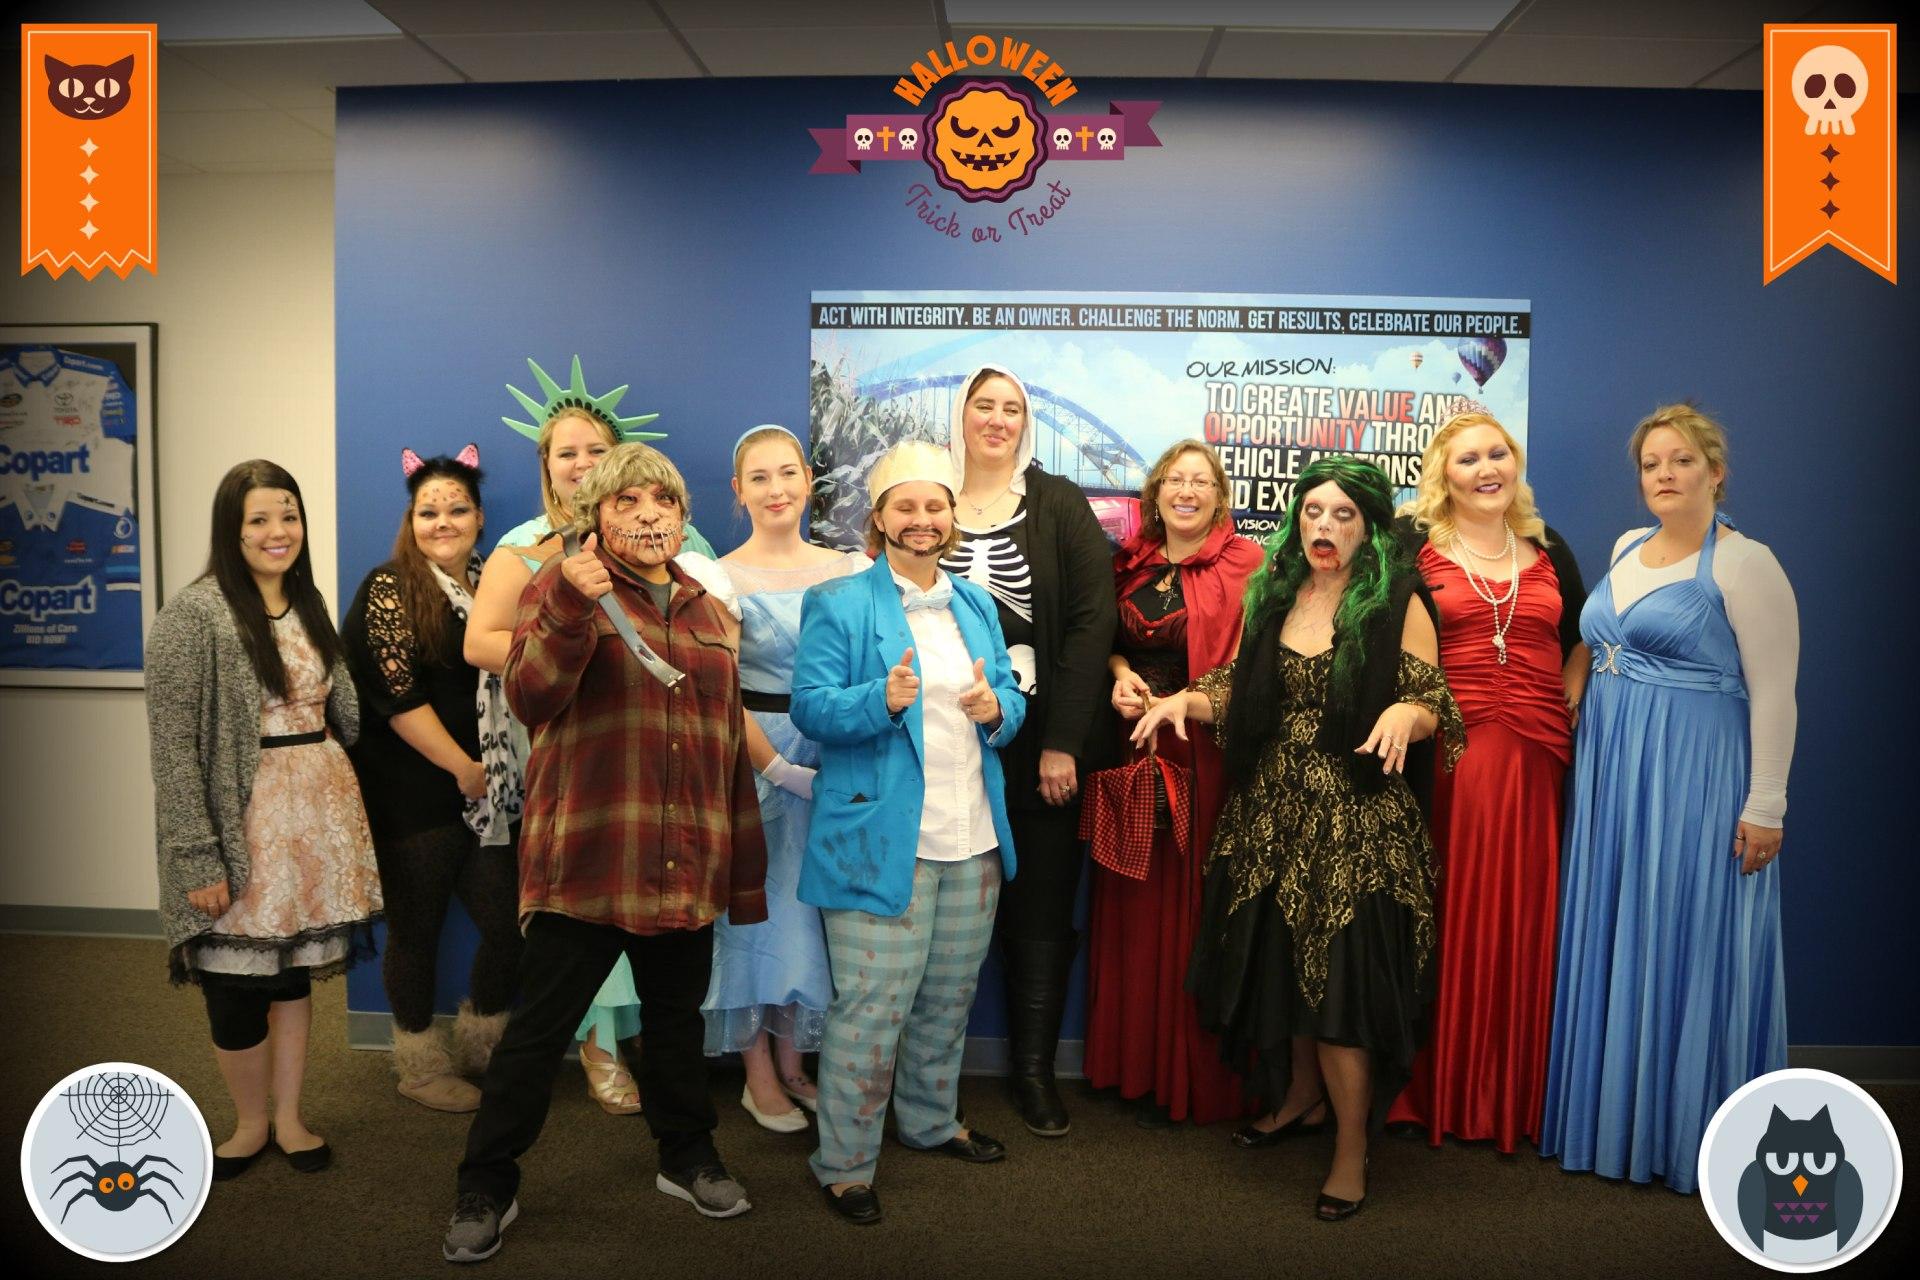 Member Service - Licensing Halloween